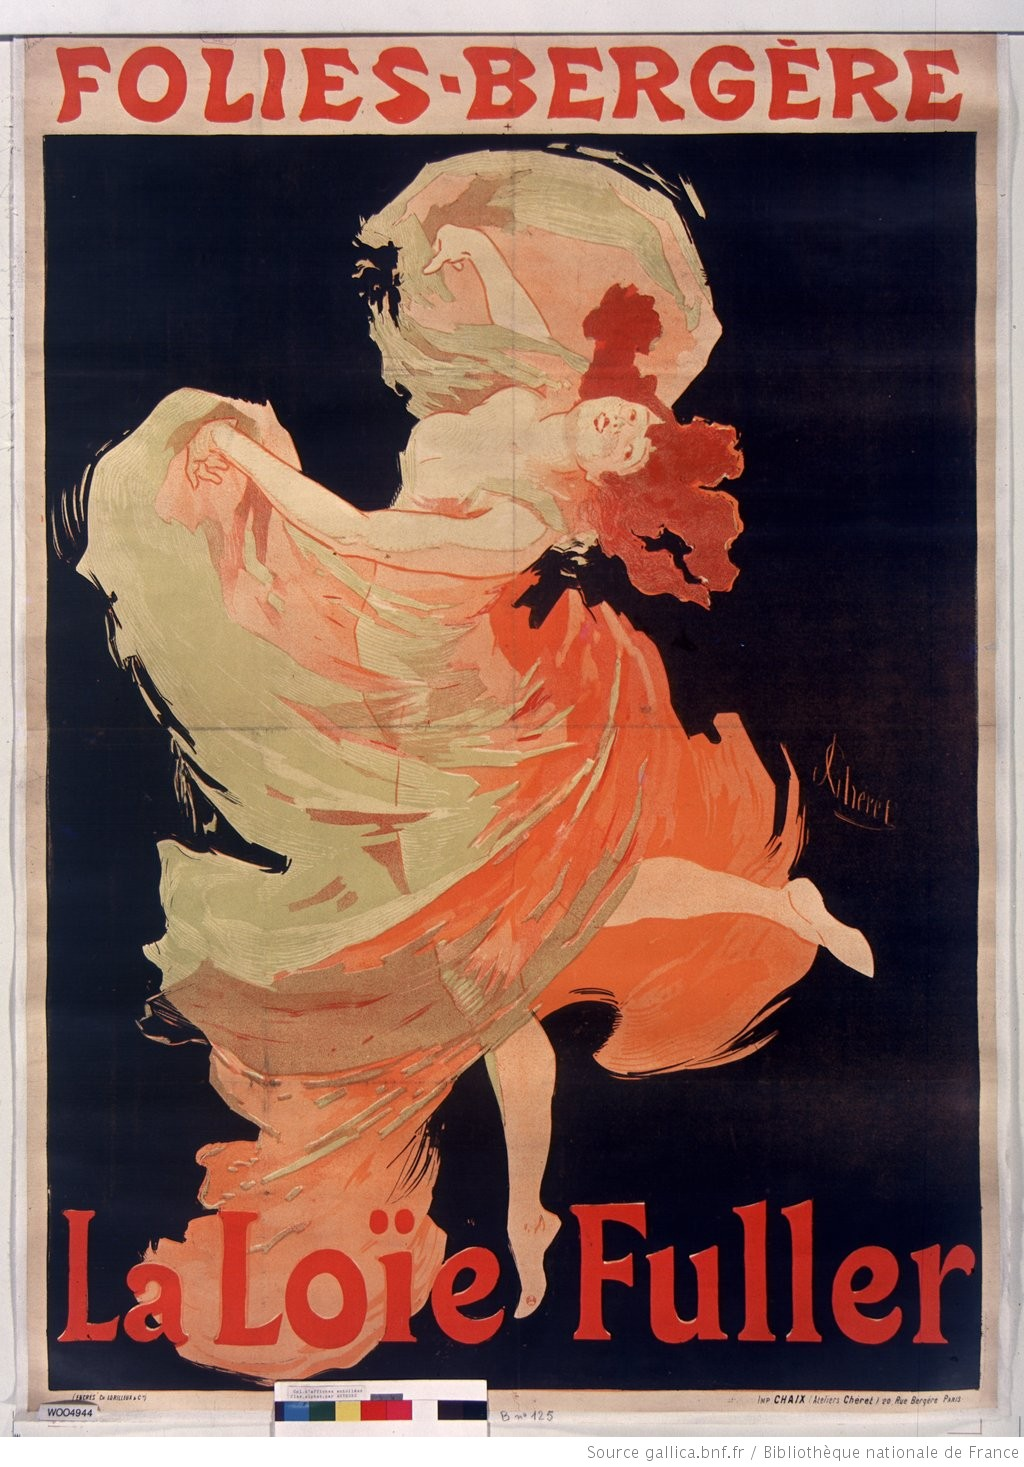 folies_bergere_la_loi%cc%88e_fuller_-cheret_jules_btv1b9015255s